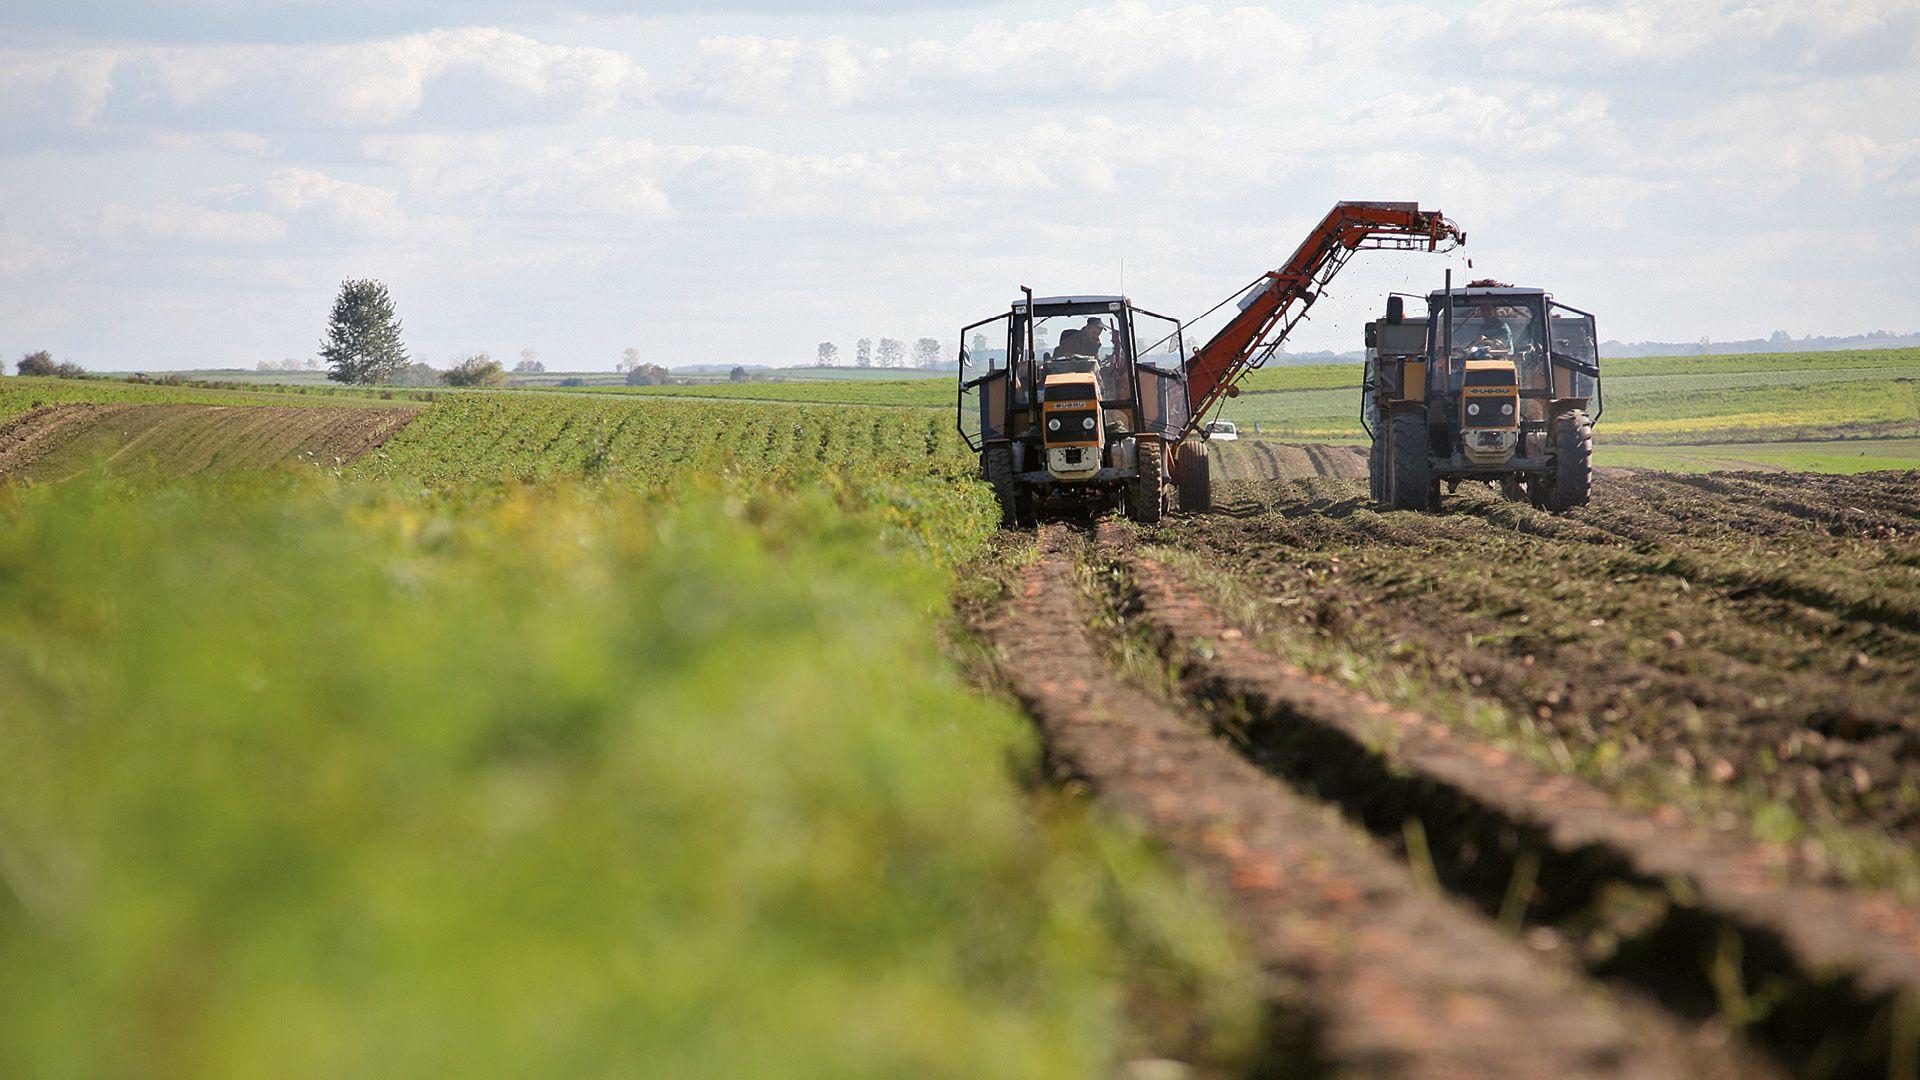 Tractor harvesting crops from field, SVZ International B.V., Breda, Netherlands